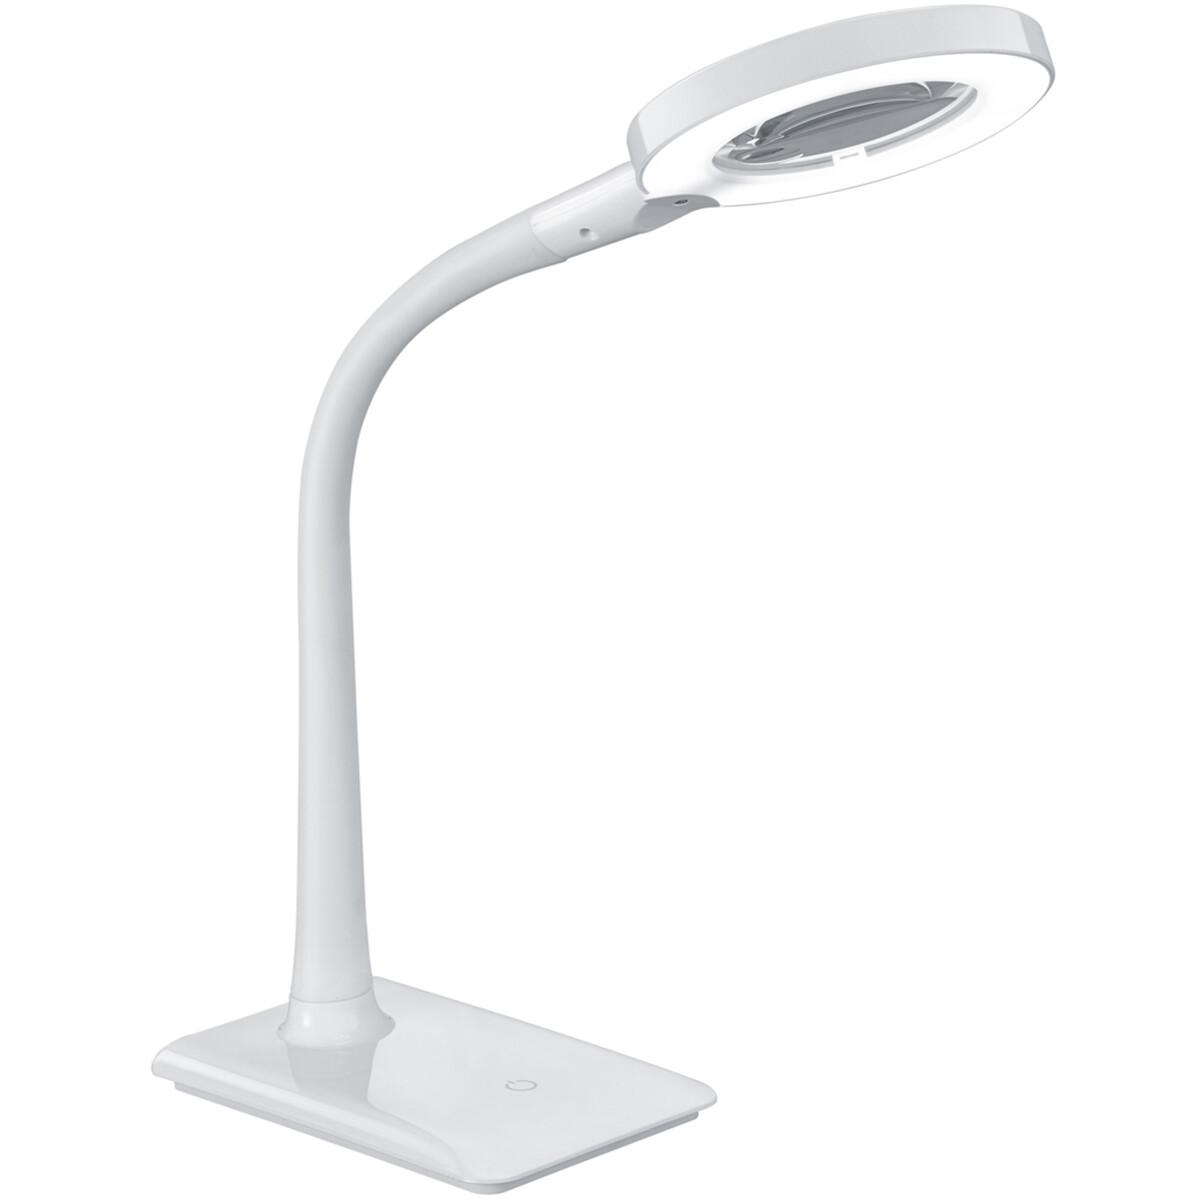 LED Tafellamp - Tafelverlichting - Trion Lumpa - 5W - Warm Wit 3000K - Rond - Mat Wit - Kunststof